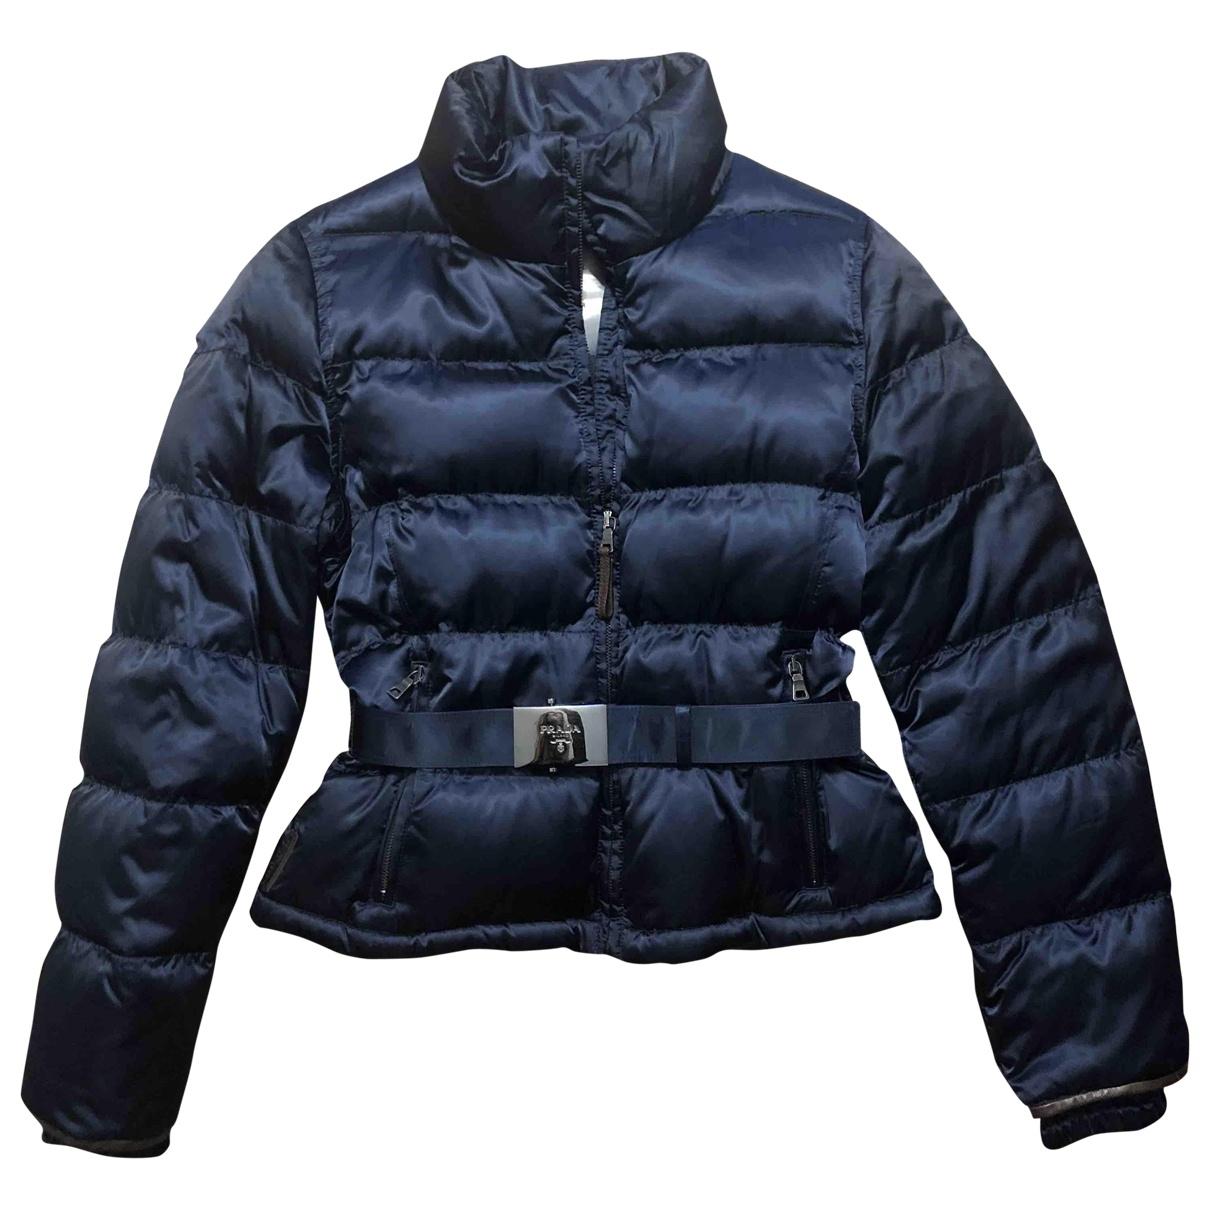 Prada \N Navy jacket for Women 42 IT